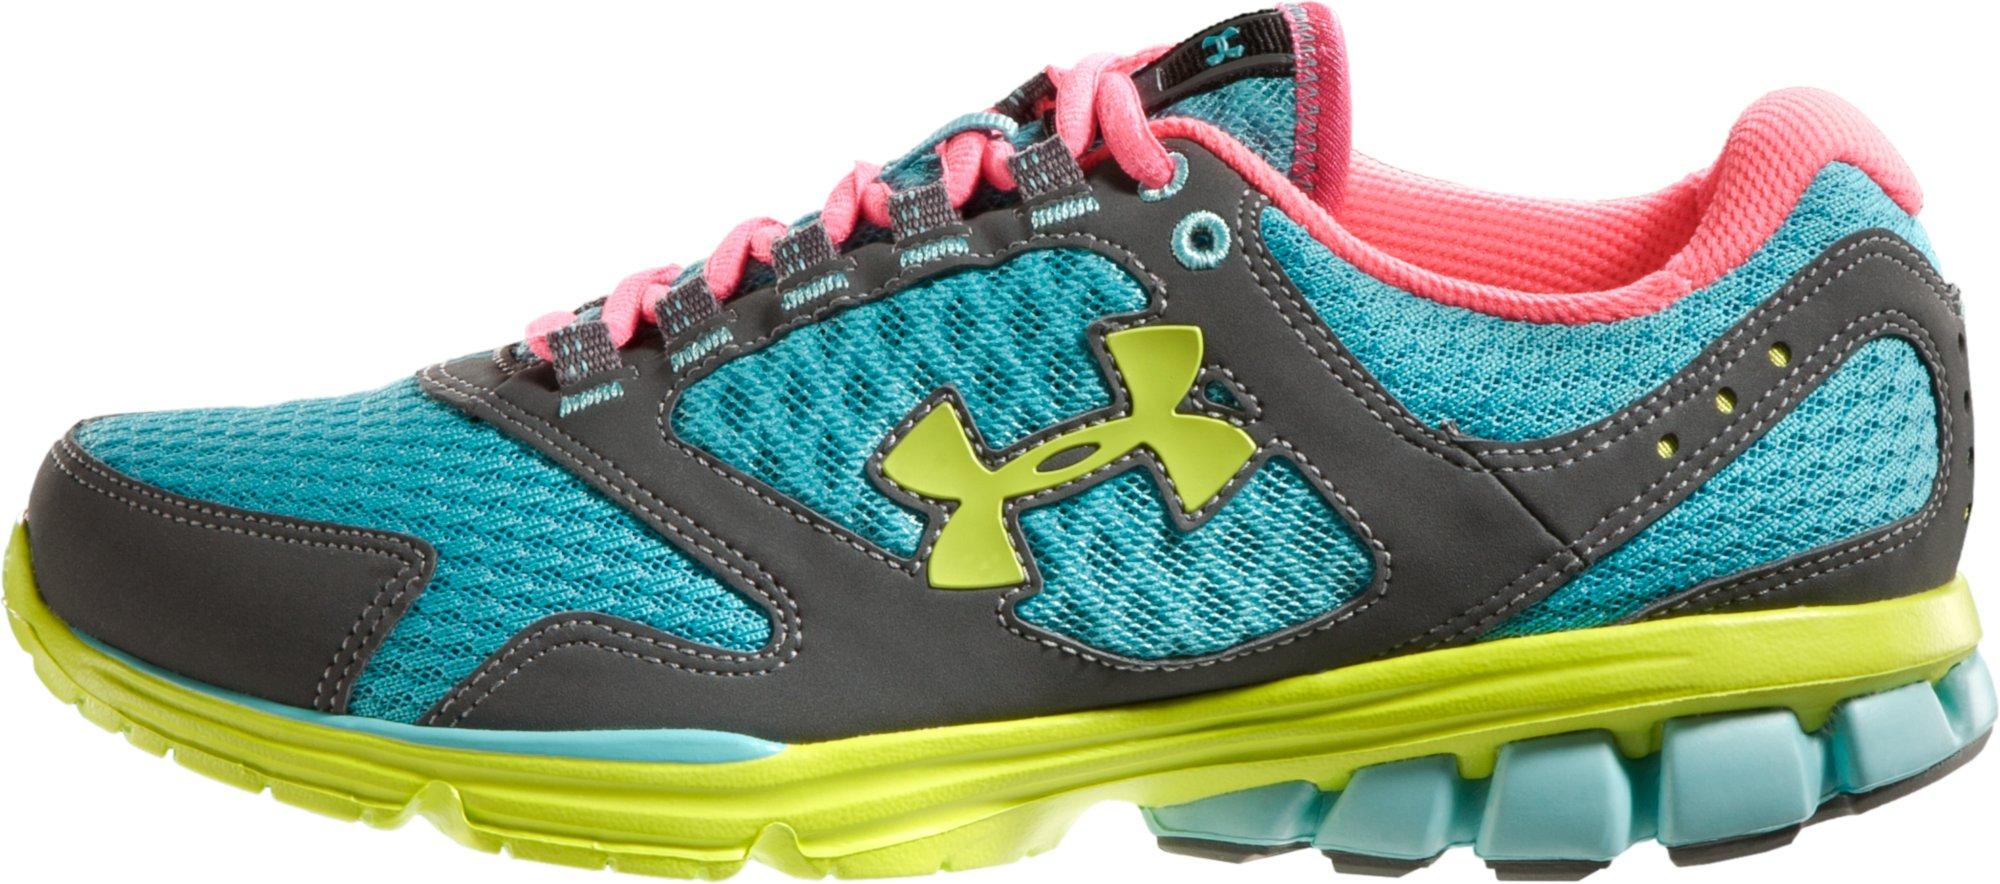 Women'S Running Shoes Wide 71